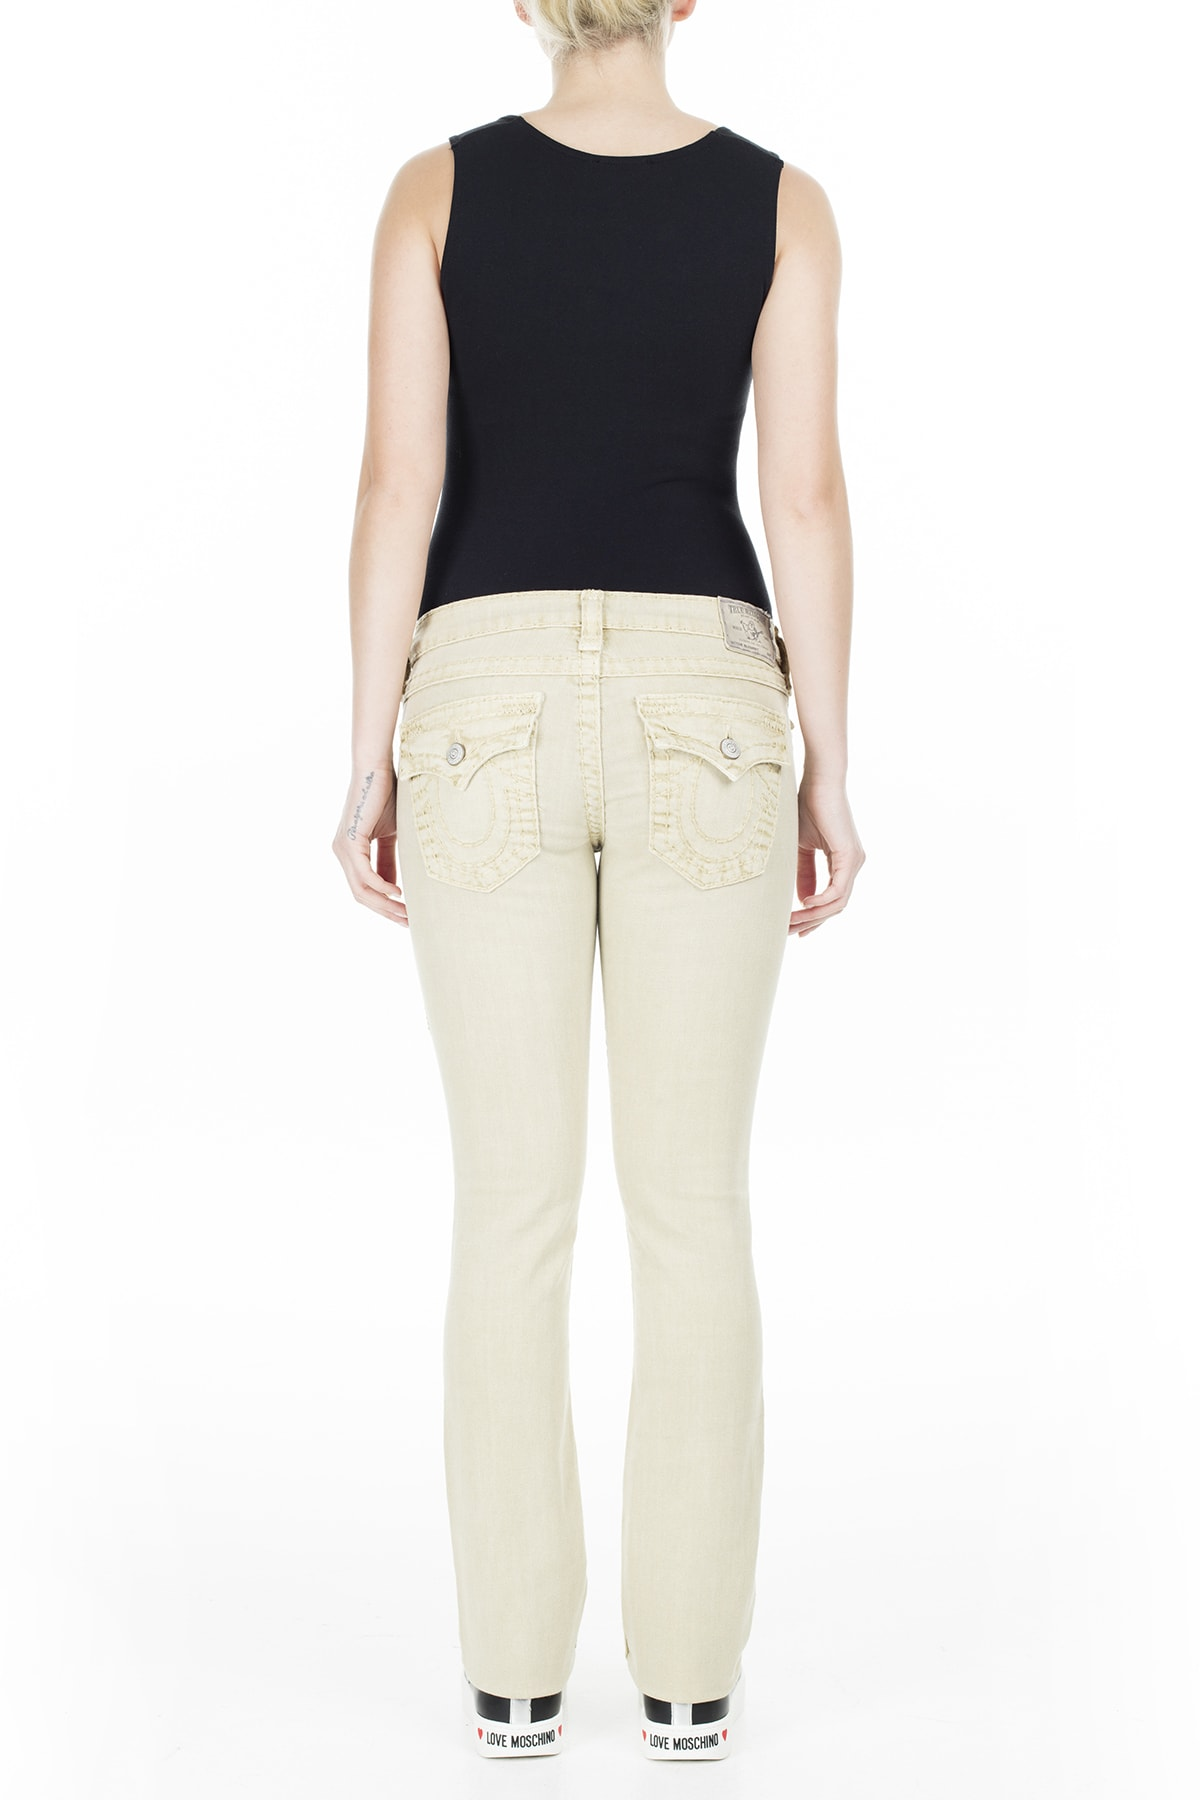 True Religion Jeans Kadın Kot Pantolon W95572N99 4